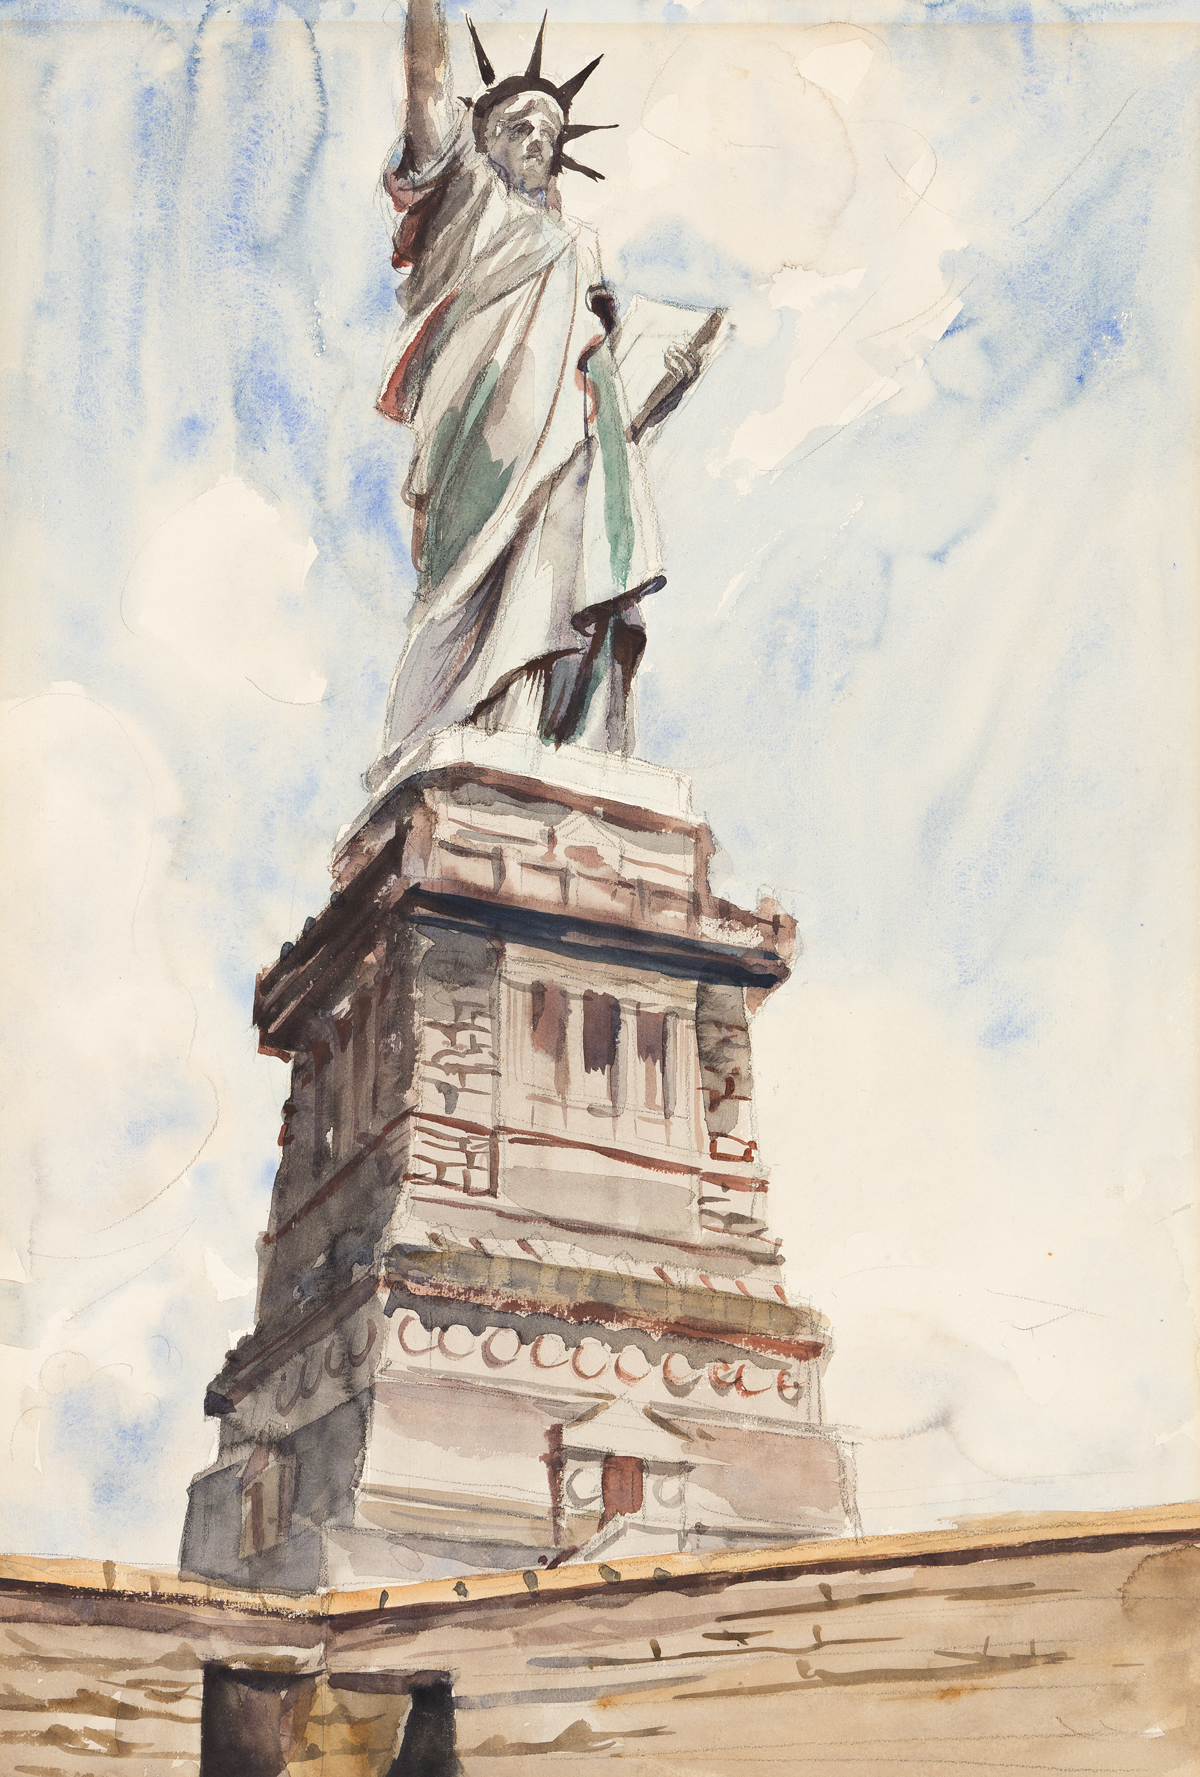 REGINALD MARSH The Statue of Liberty.